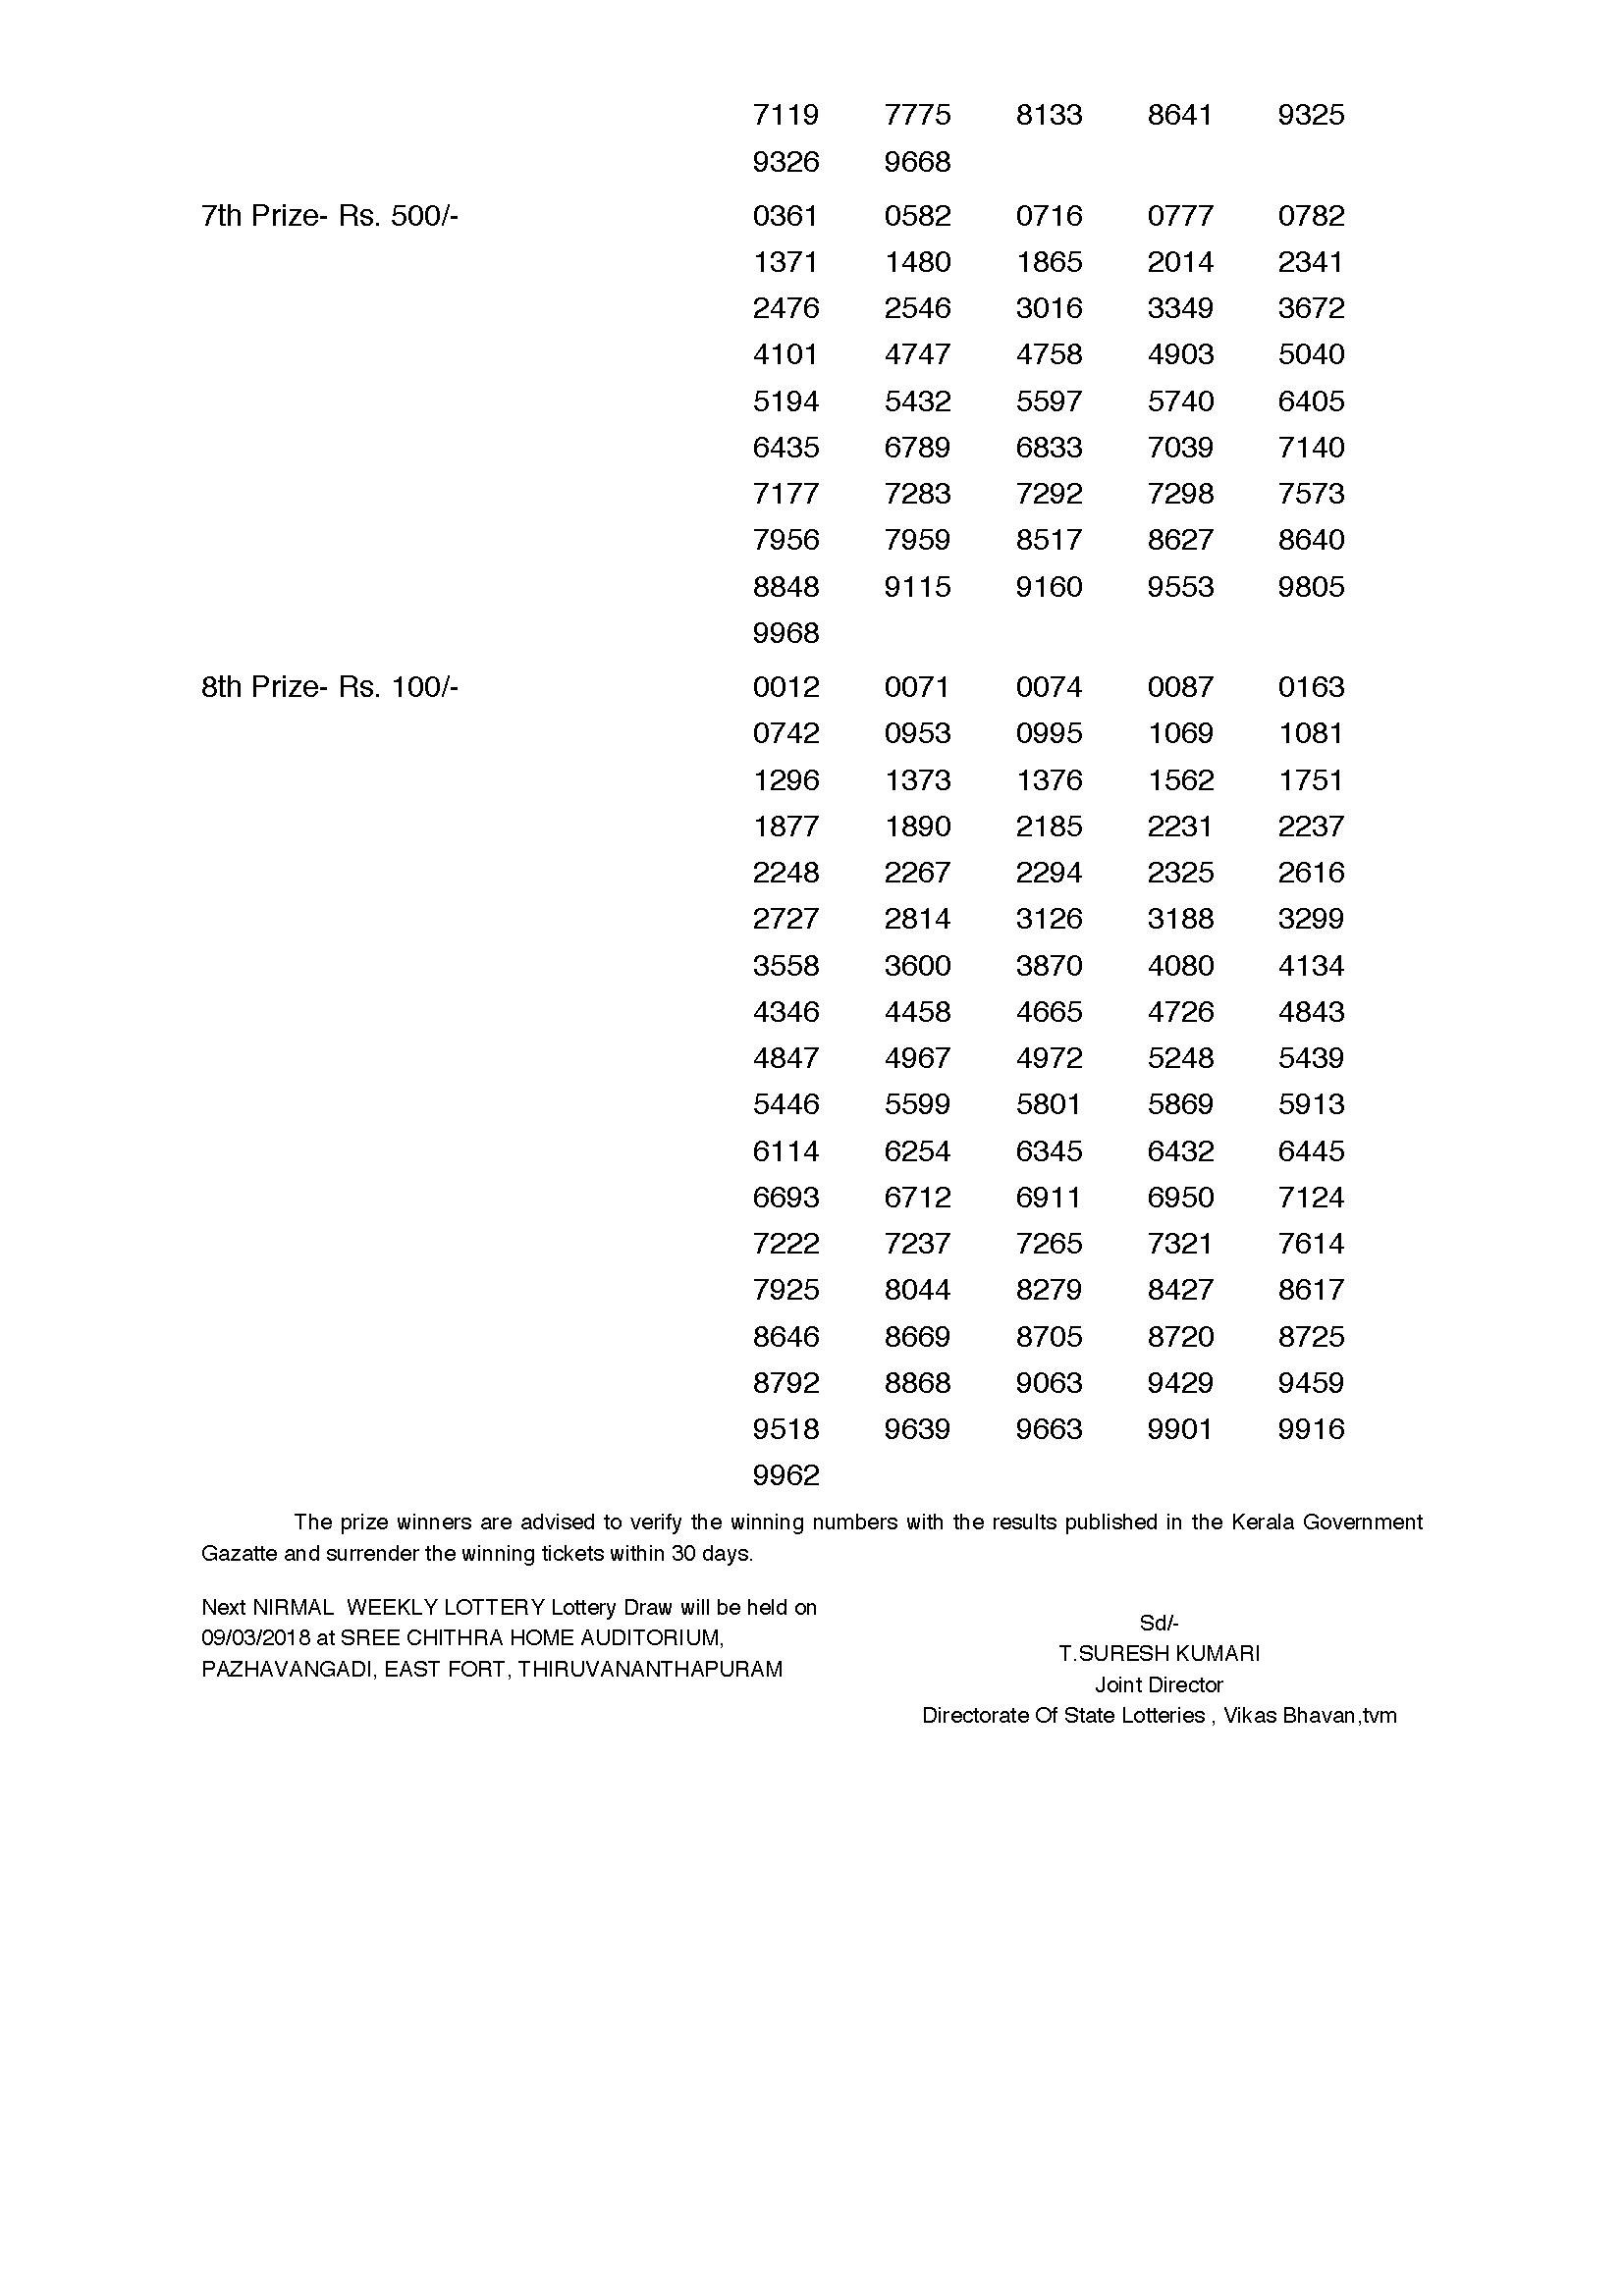 Nirmal NR58 Kerala Lottery Result: Page 2